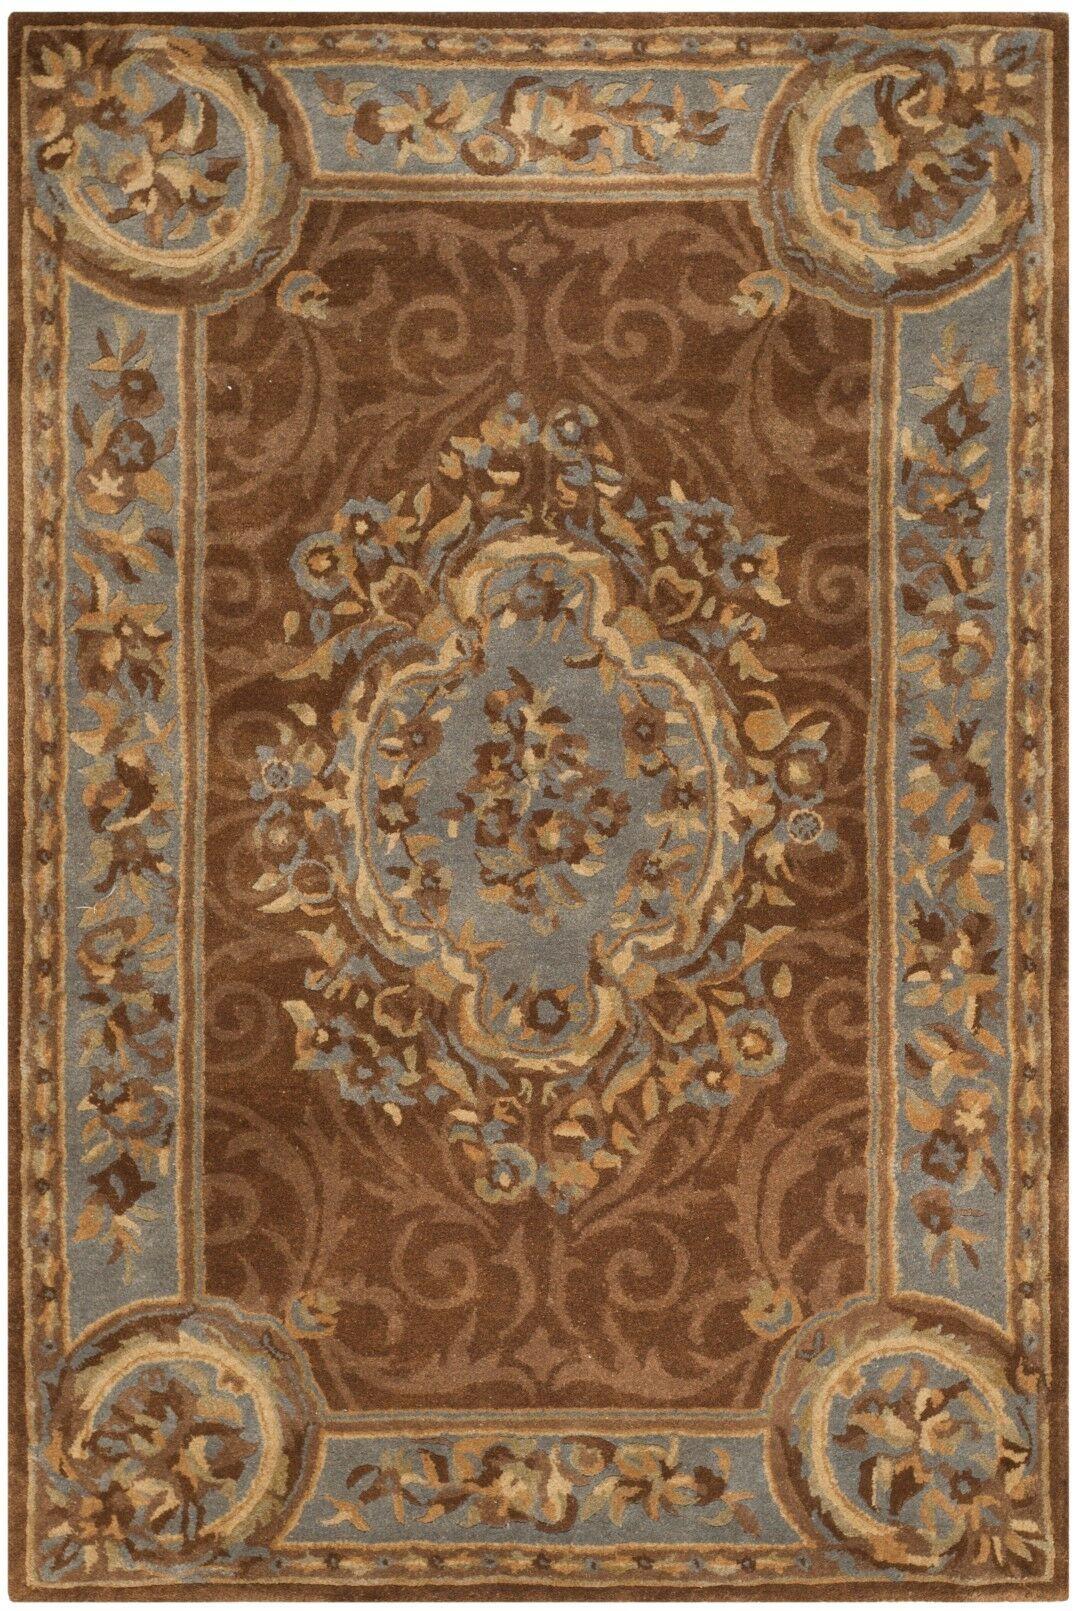 Sandusky Hand-Tufted Blue / Brown Area Rug Rug Size: Rectangle 4' x 6'